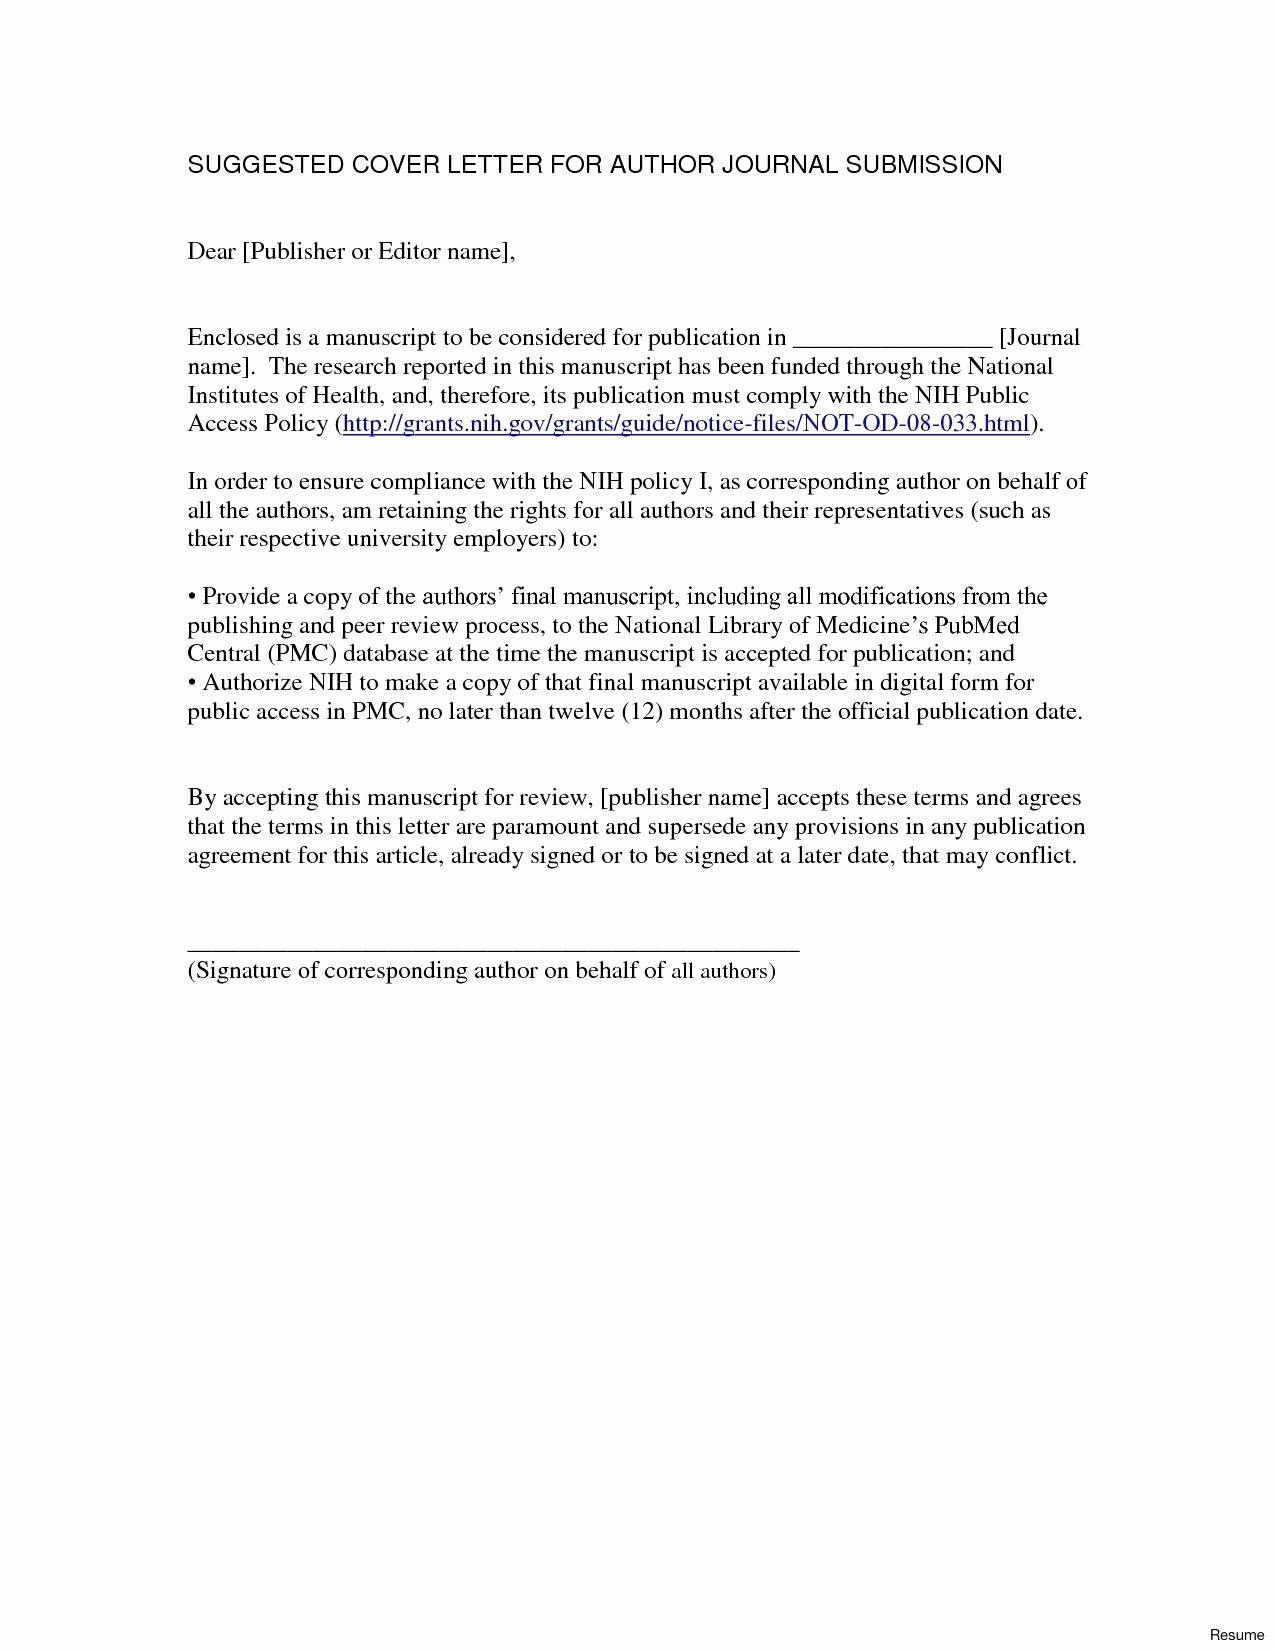 Court Appeal Letter Sample New 98 Sample Clerical Cover Letter Cover Letter for